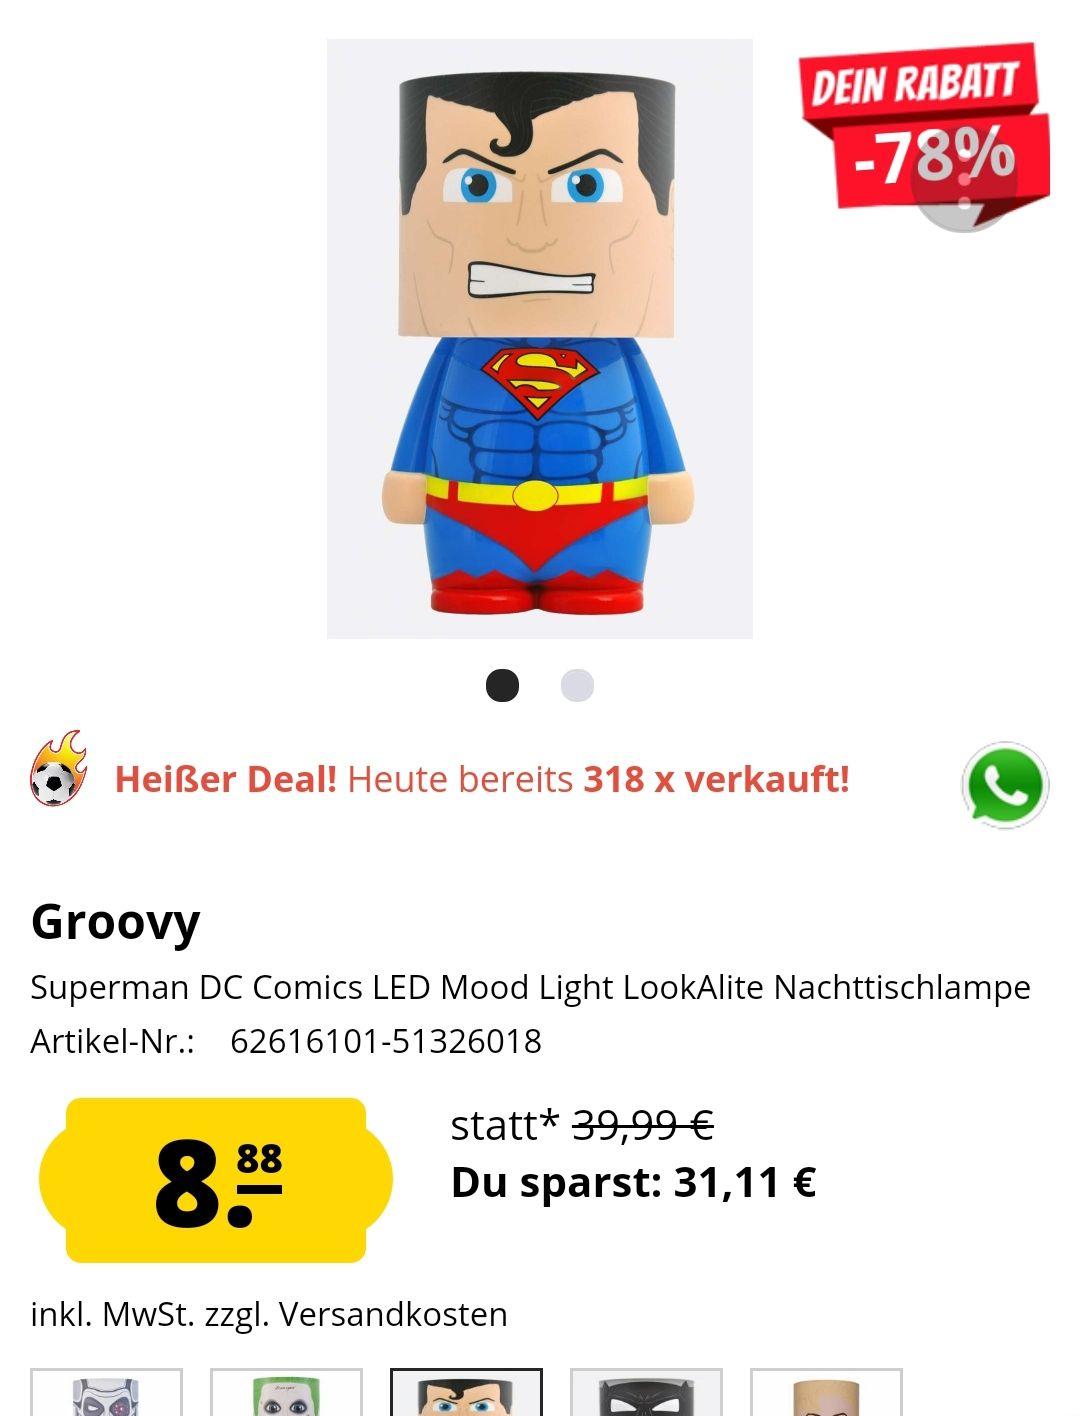 Superman DC Comics LED Mood Light LookAlite Nachttischlampe Incl Versand